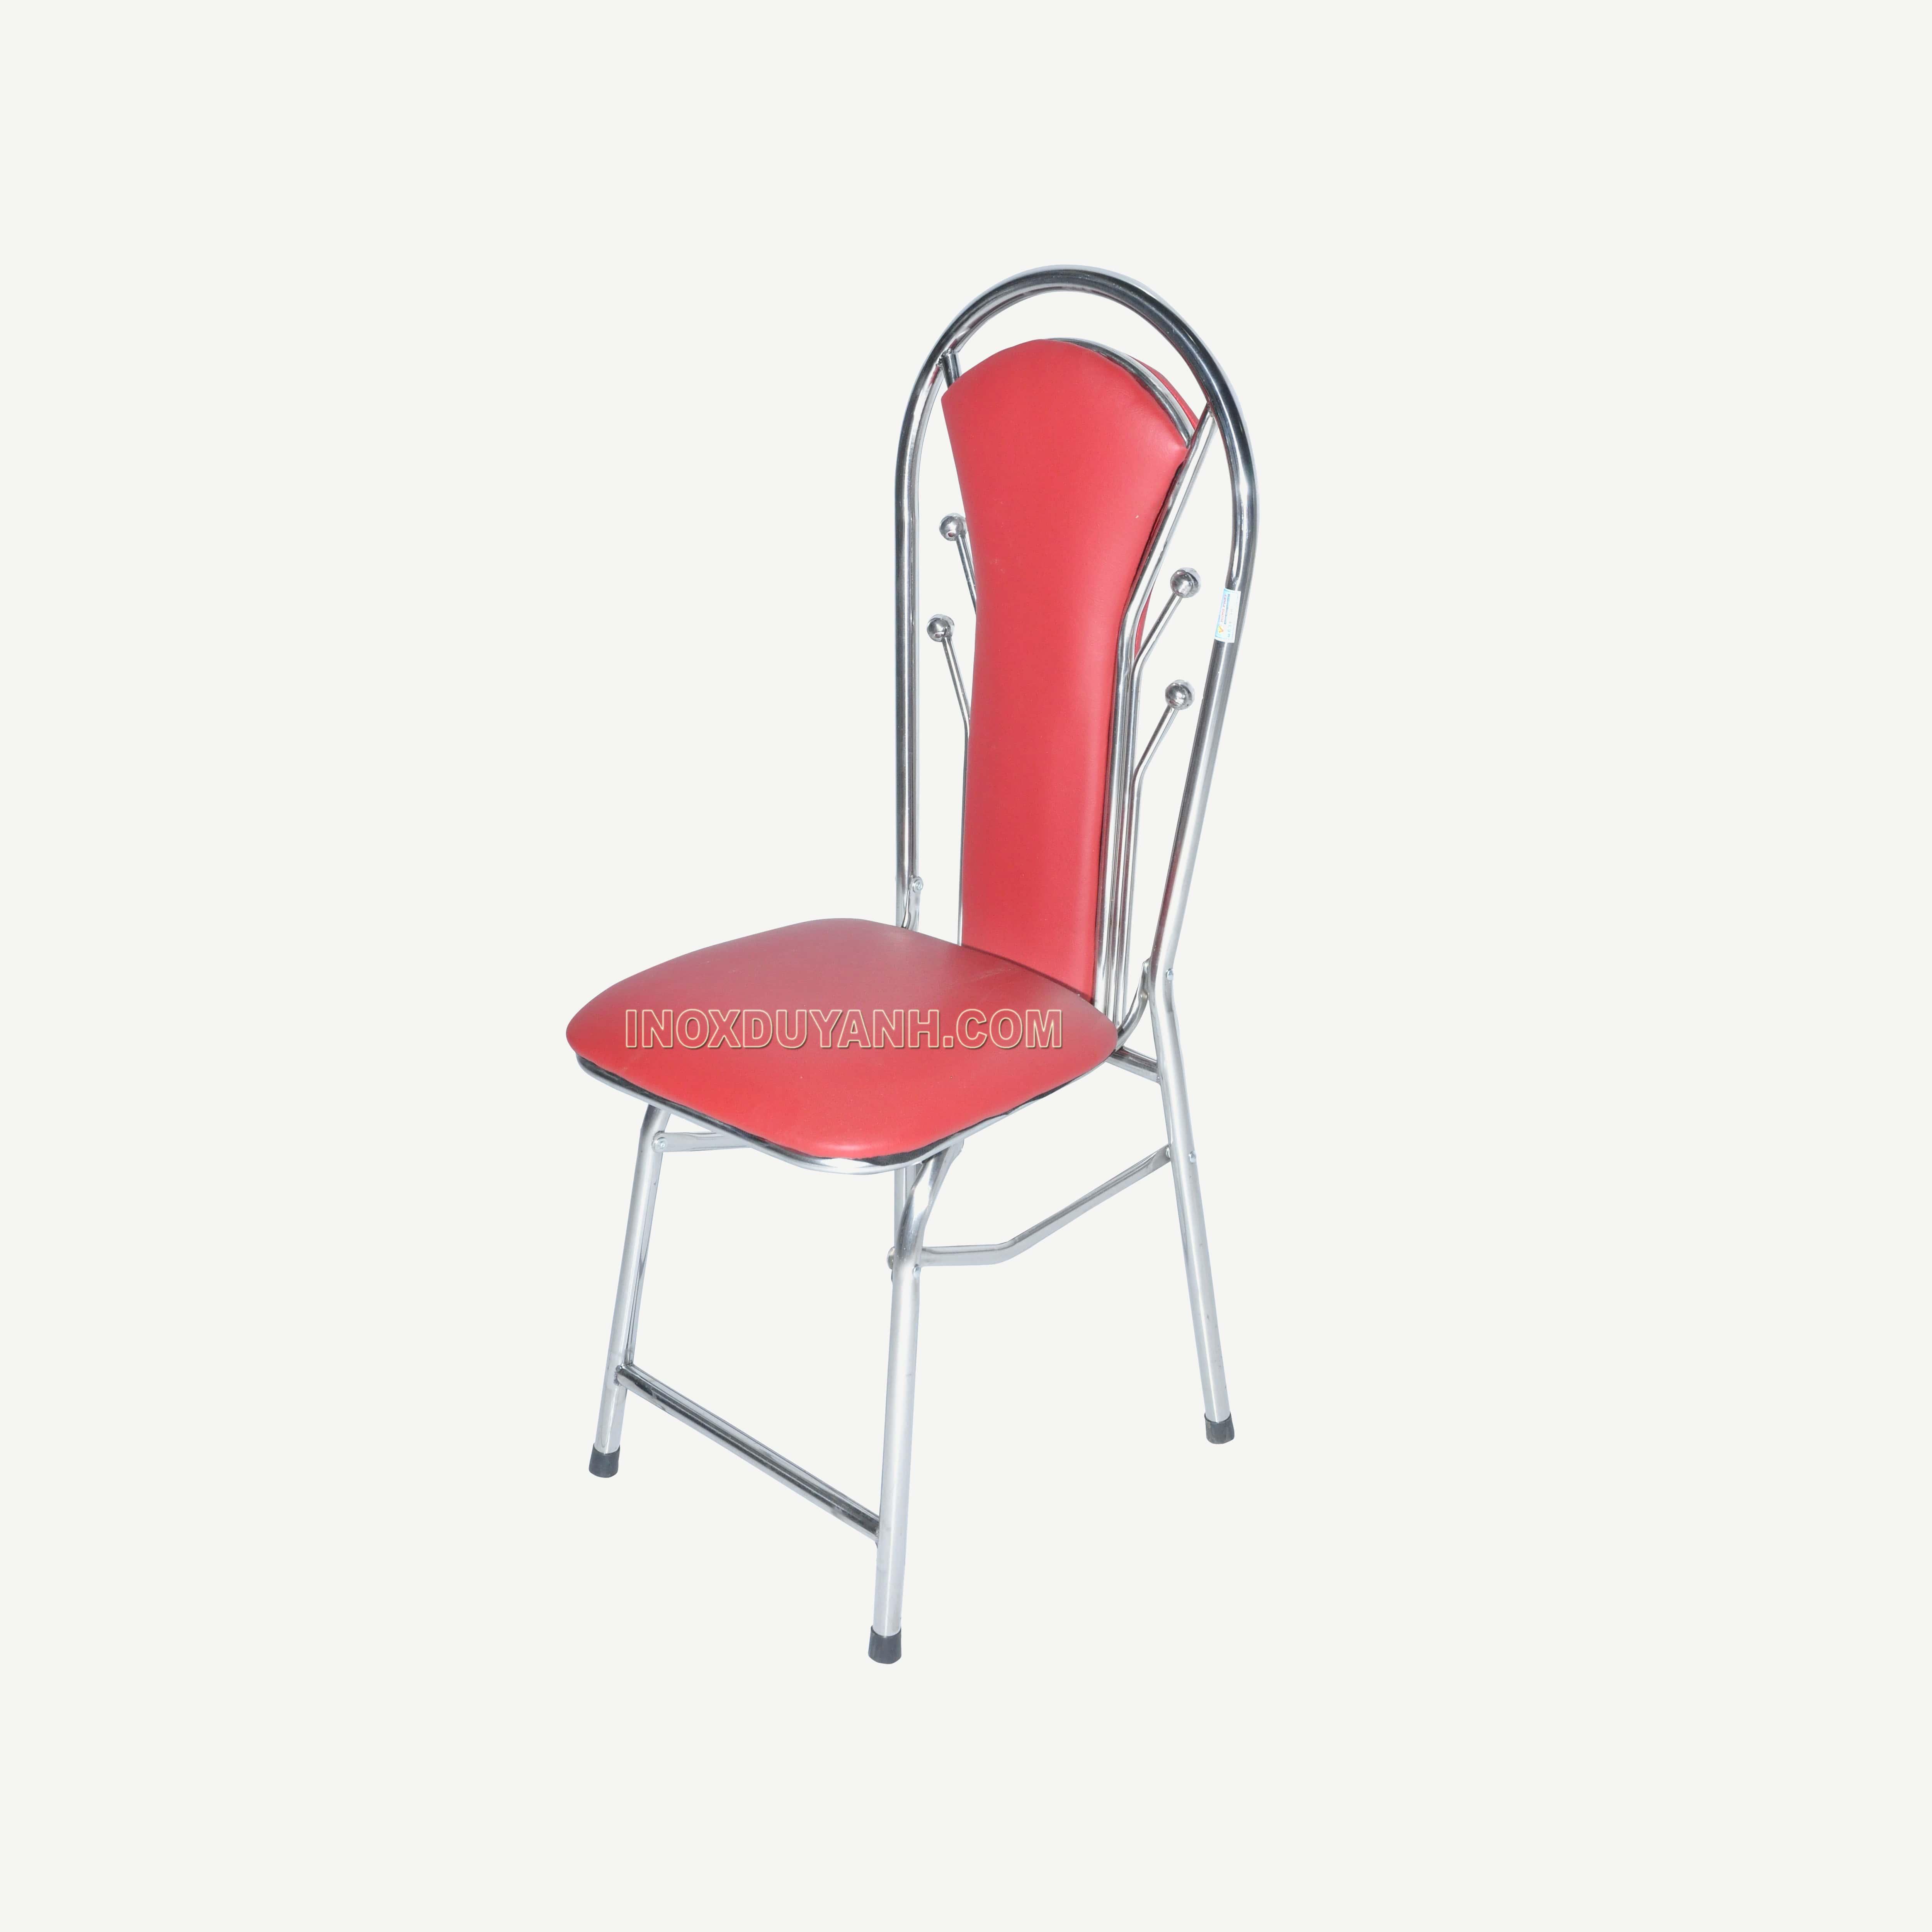 Ghế inox 4 bi | Ghế inox tựa lưng